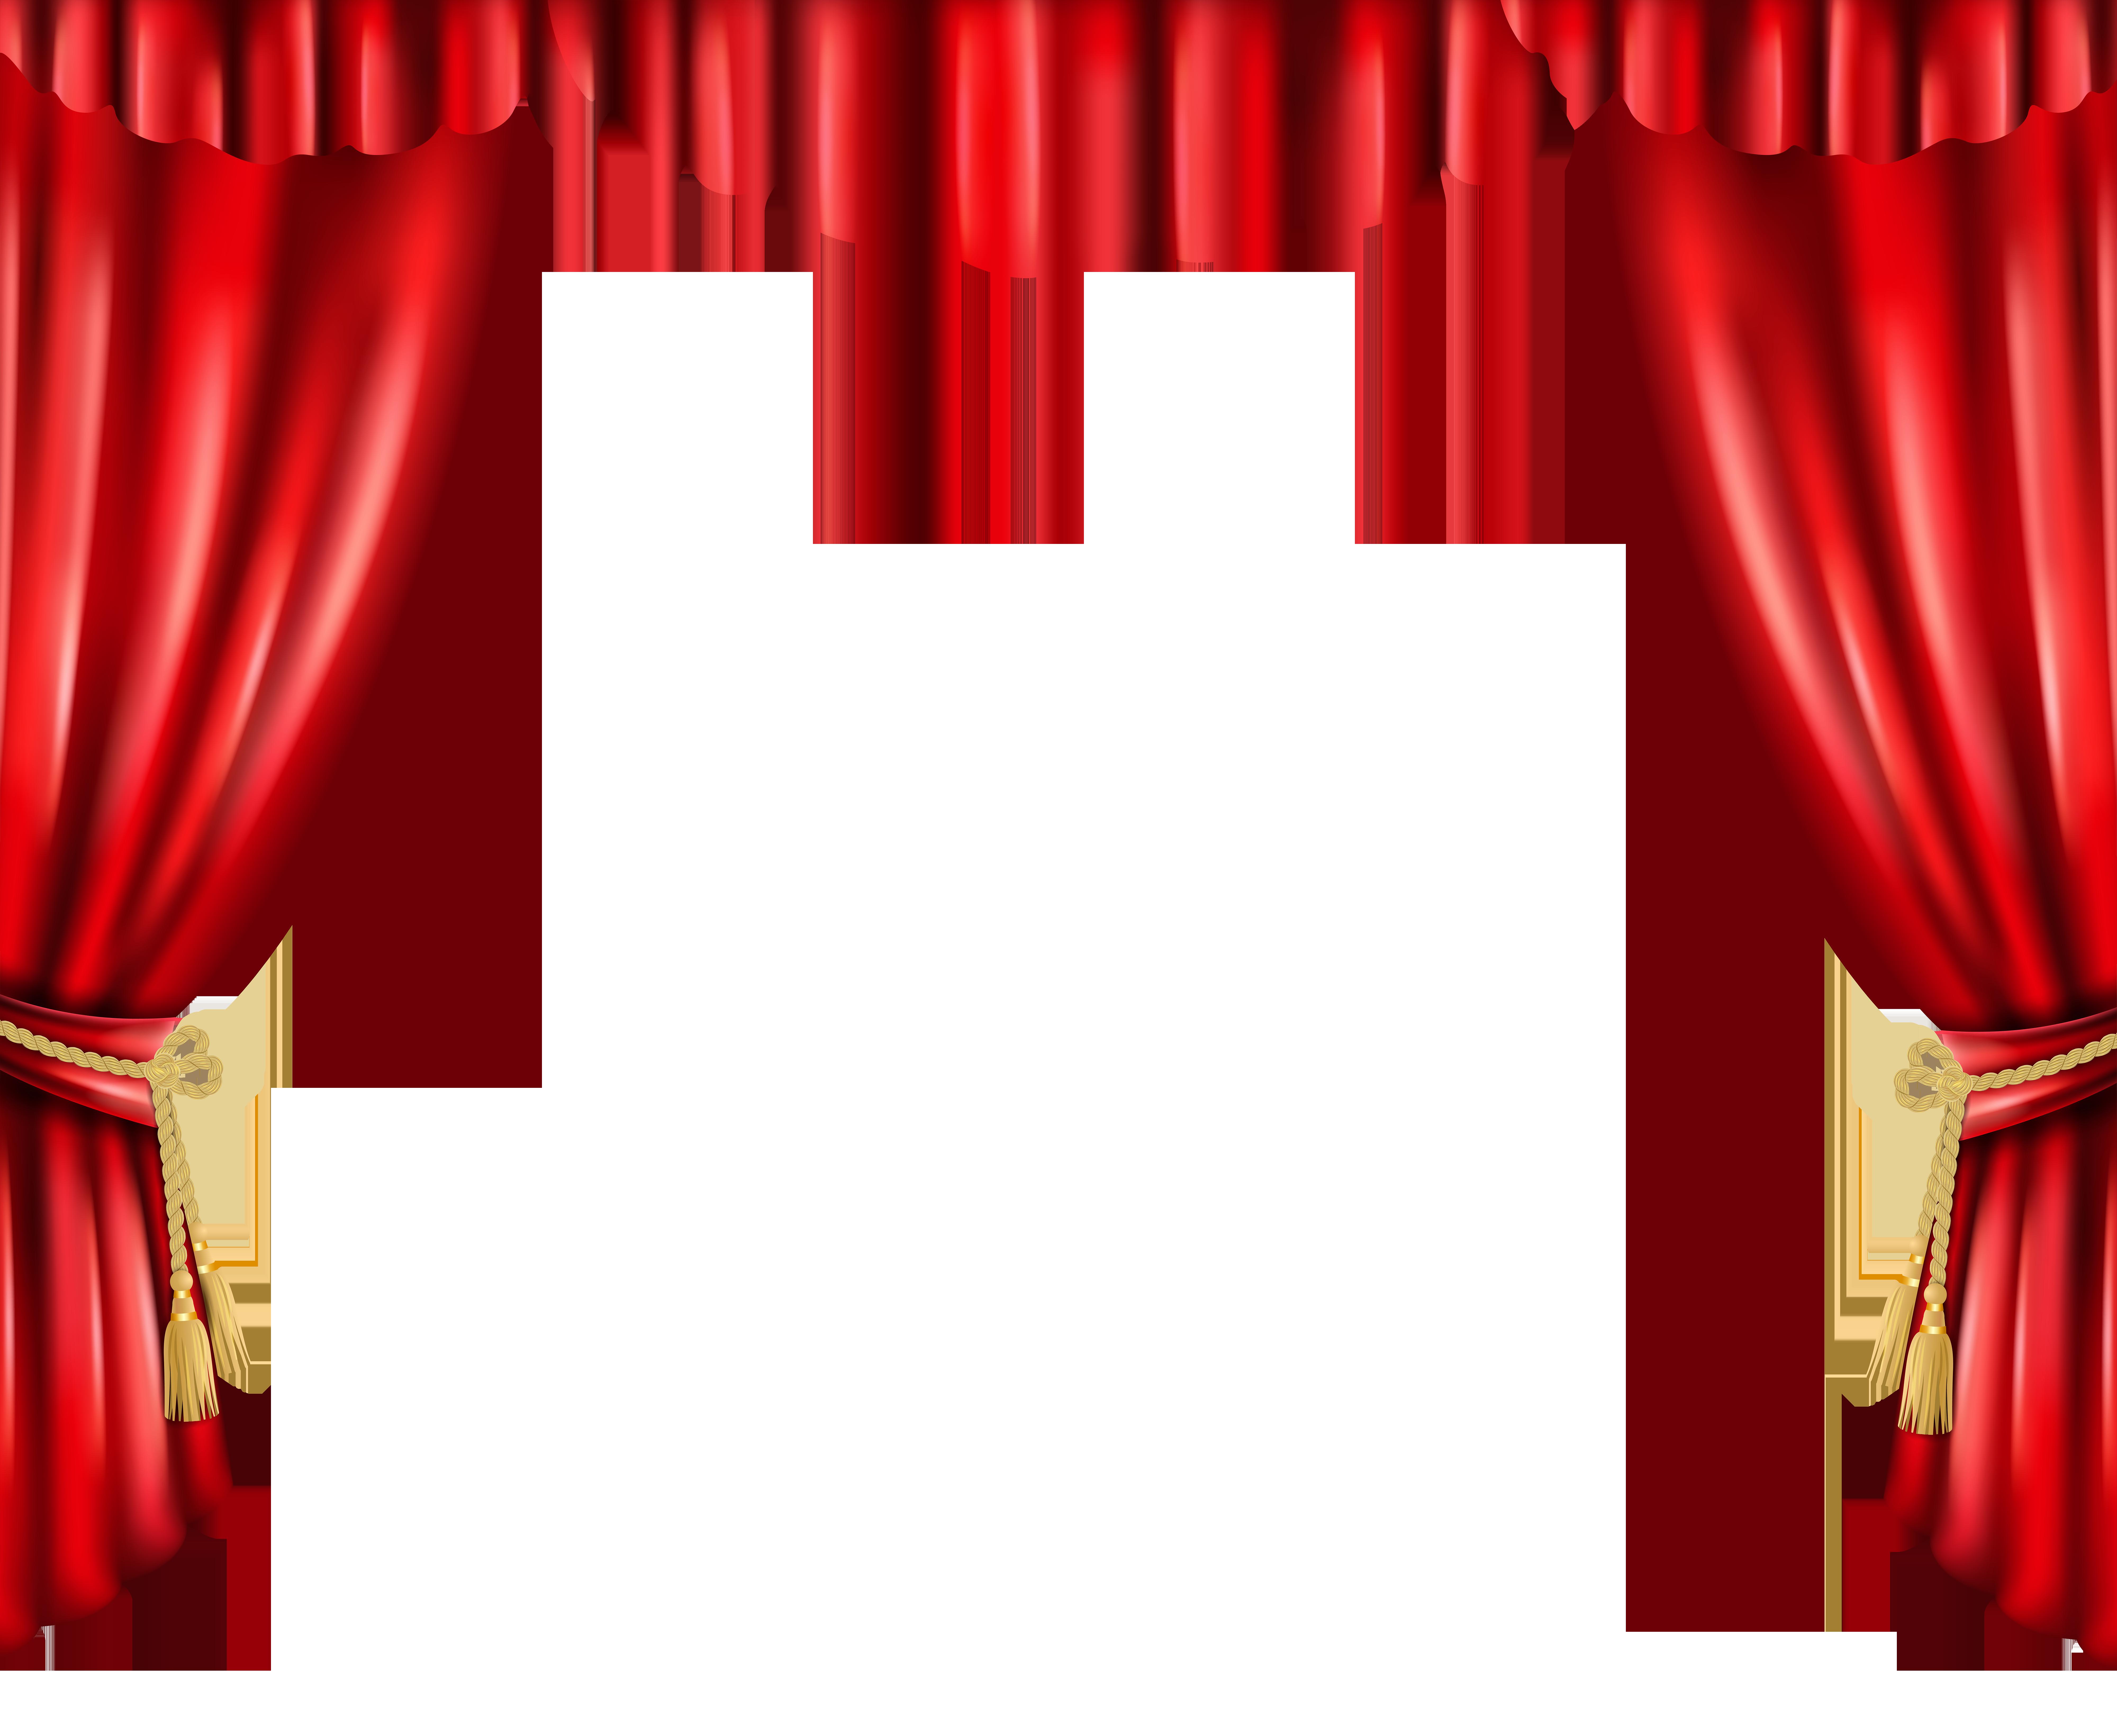 Curtain PNG Transparent Clip Art Image.